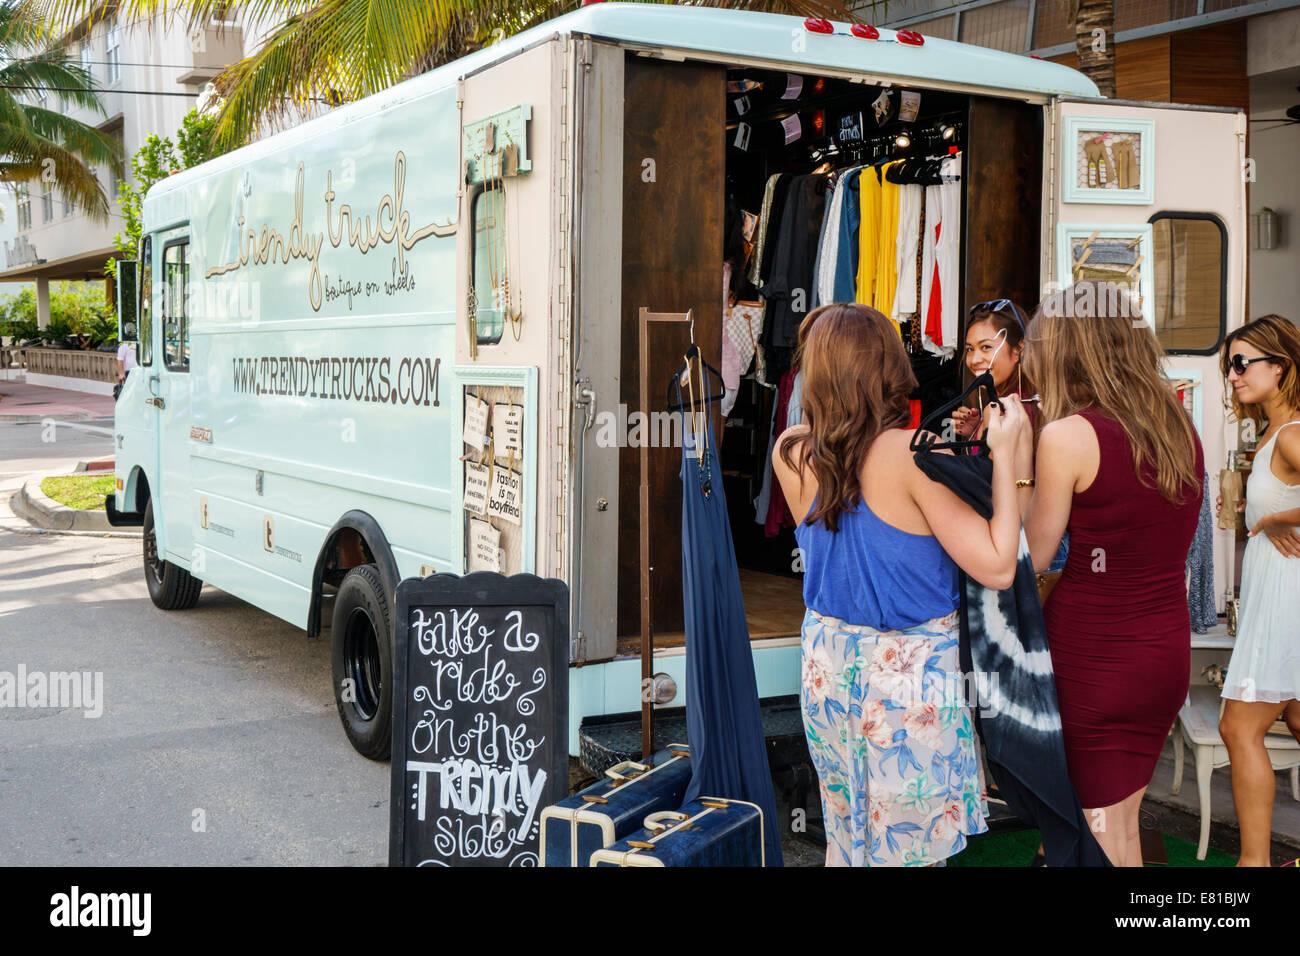 Florida, FL, Süd, Miami Beach, 'Ocean Drive', Pop-up-Store, trendy Truck, Mode, trendy, Frauen, Kleidung, Kleidung, Stockfoto